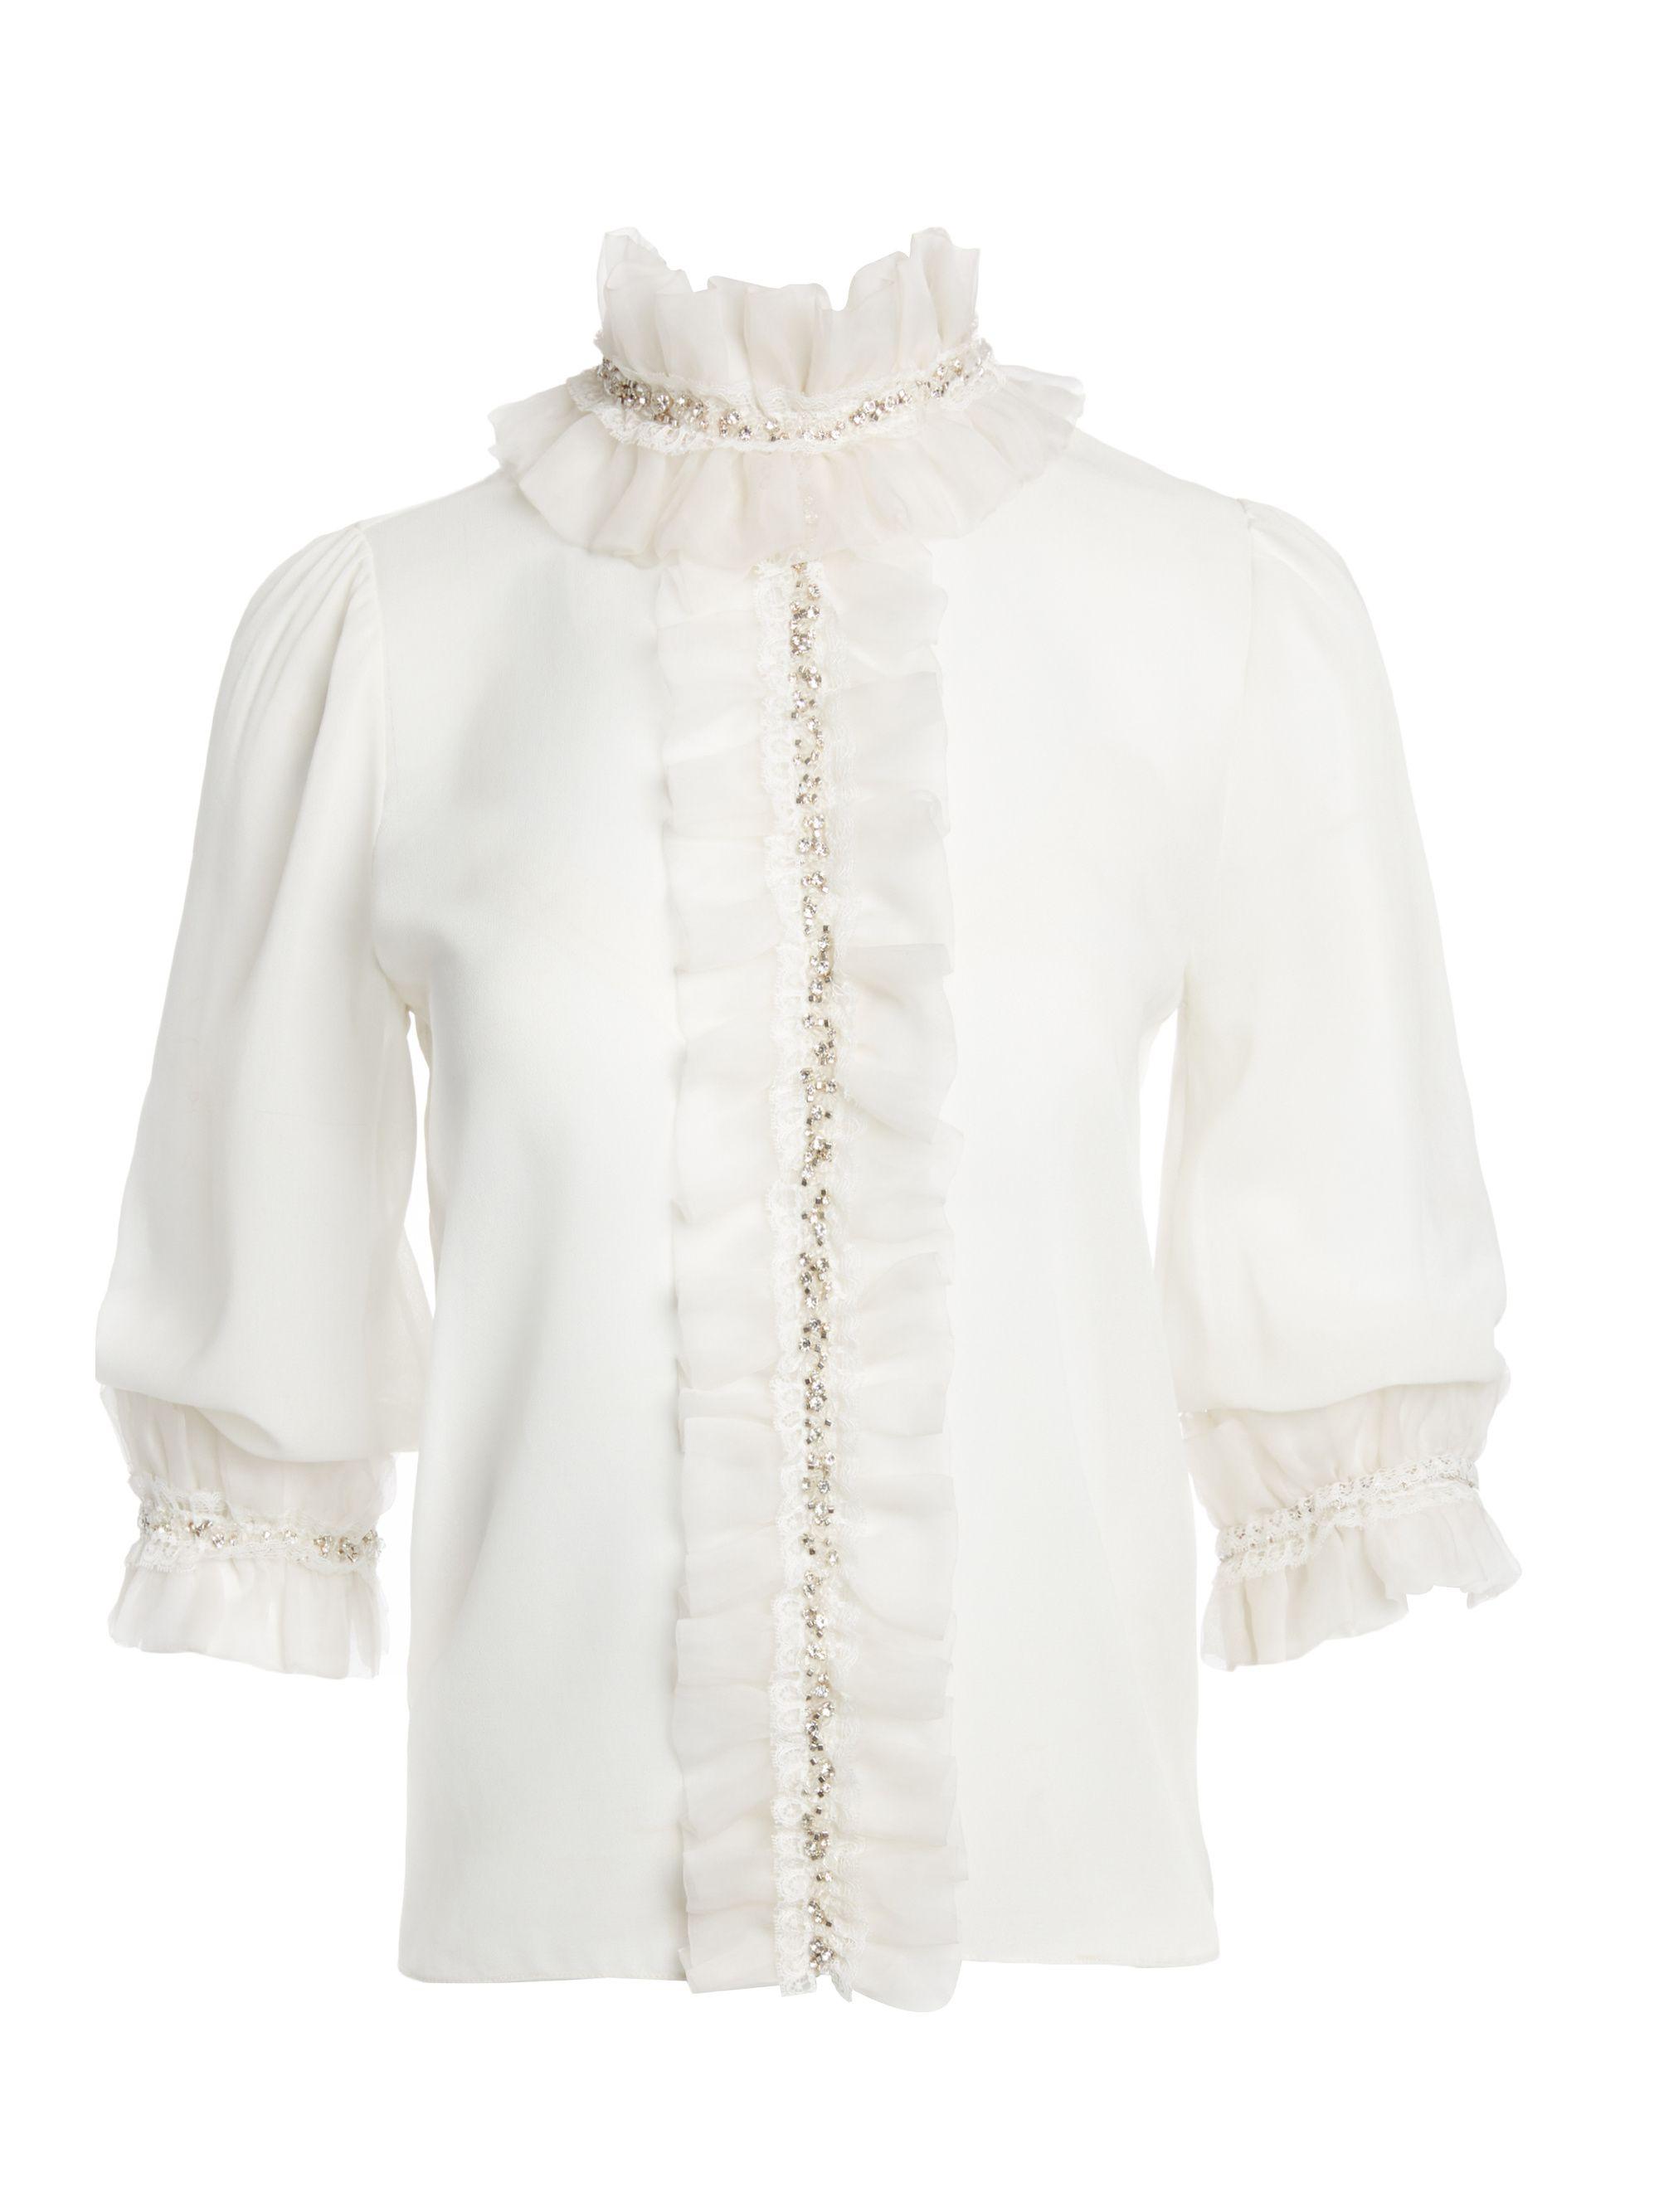 05f3440b001c3 Mira crystal ruffle blouse woman tops pinterest ruffle blouse jpg 2000x2667  Crystal collar blouse